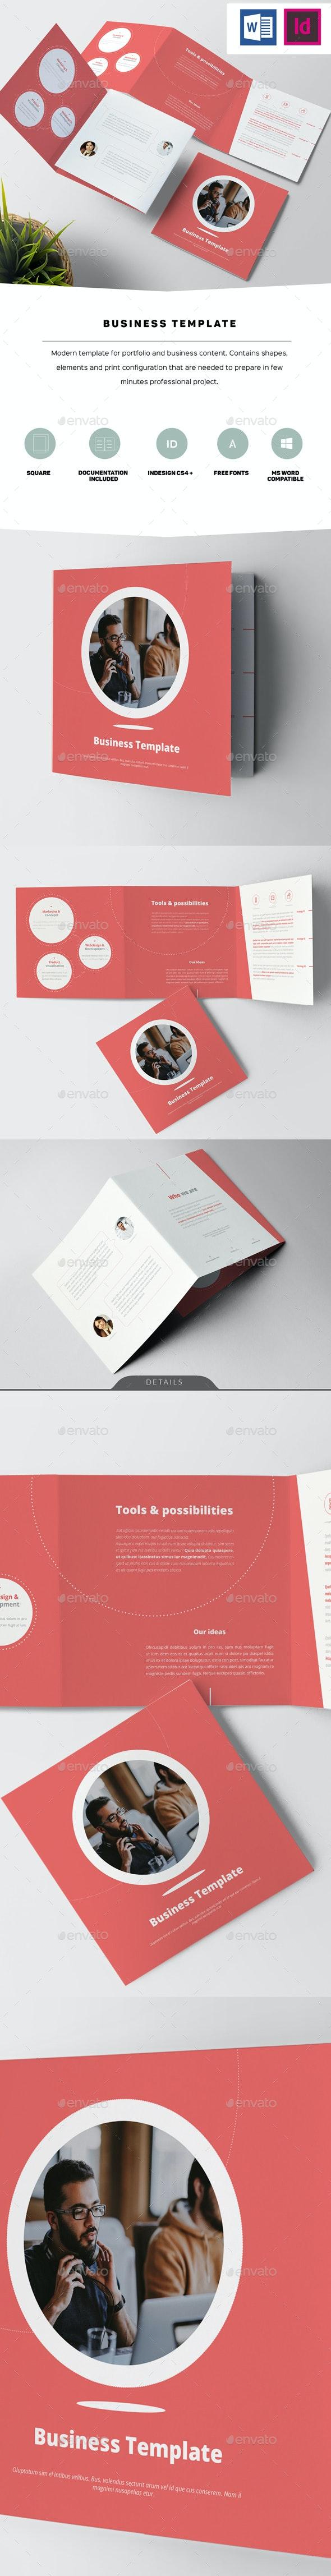 Business Template - Corporate Brochures